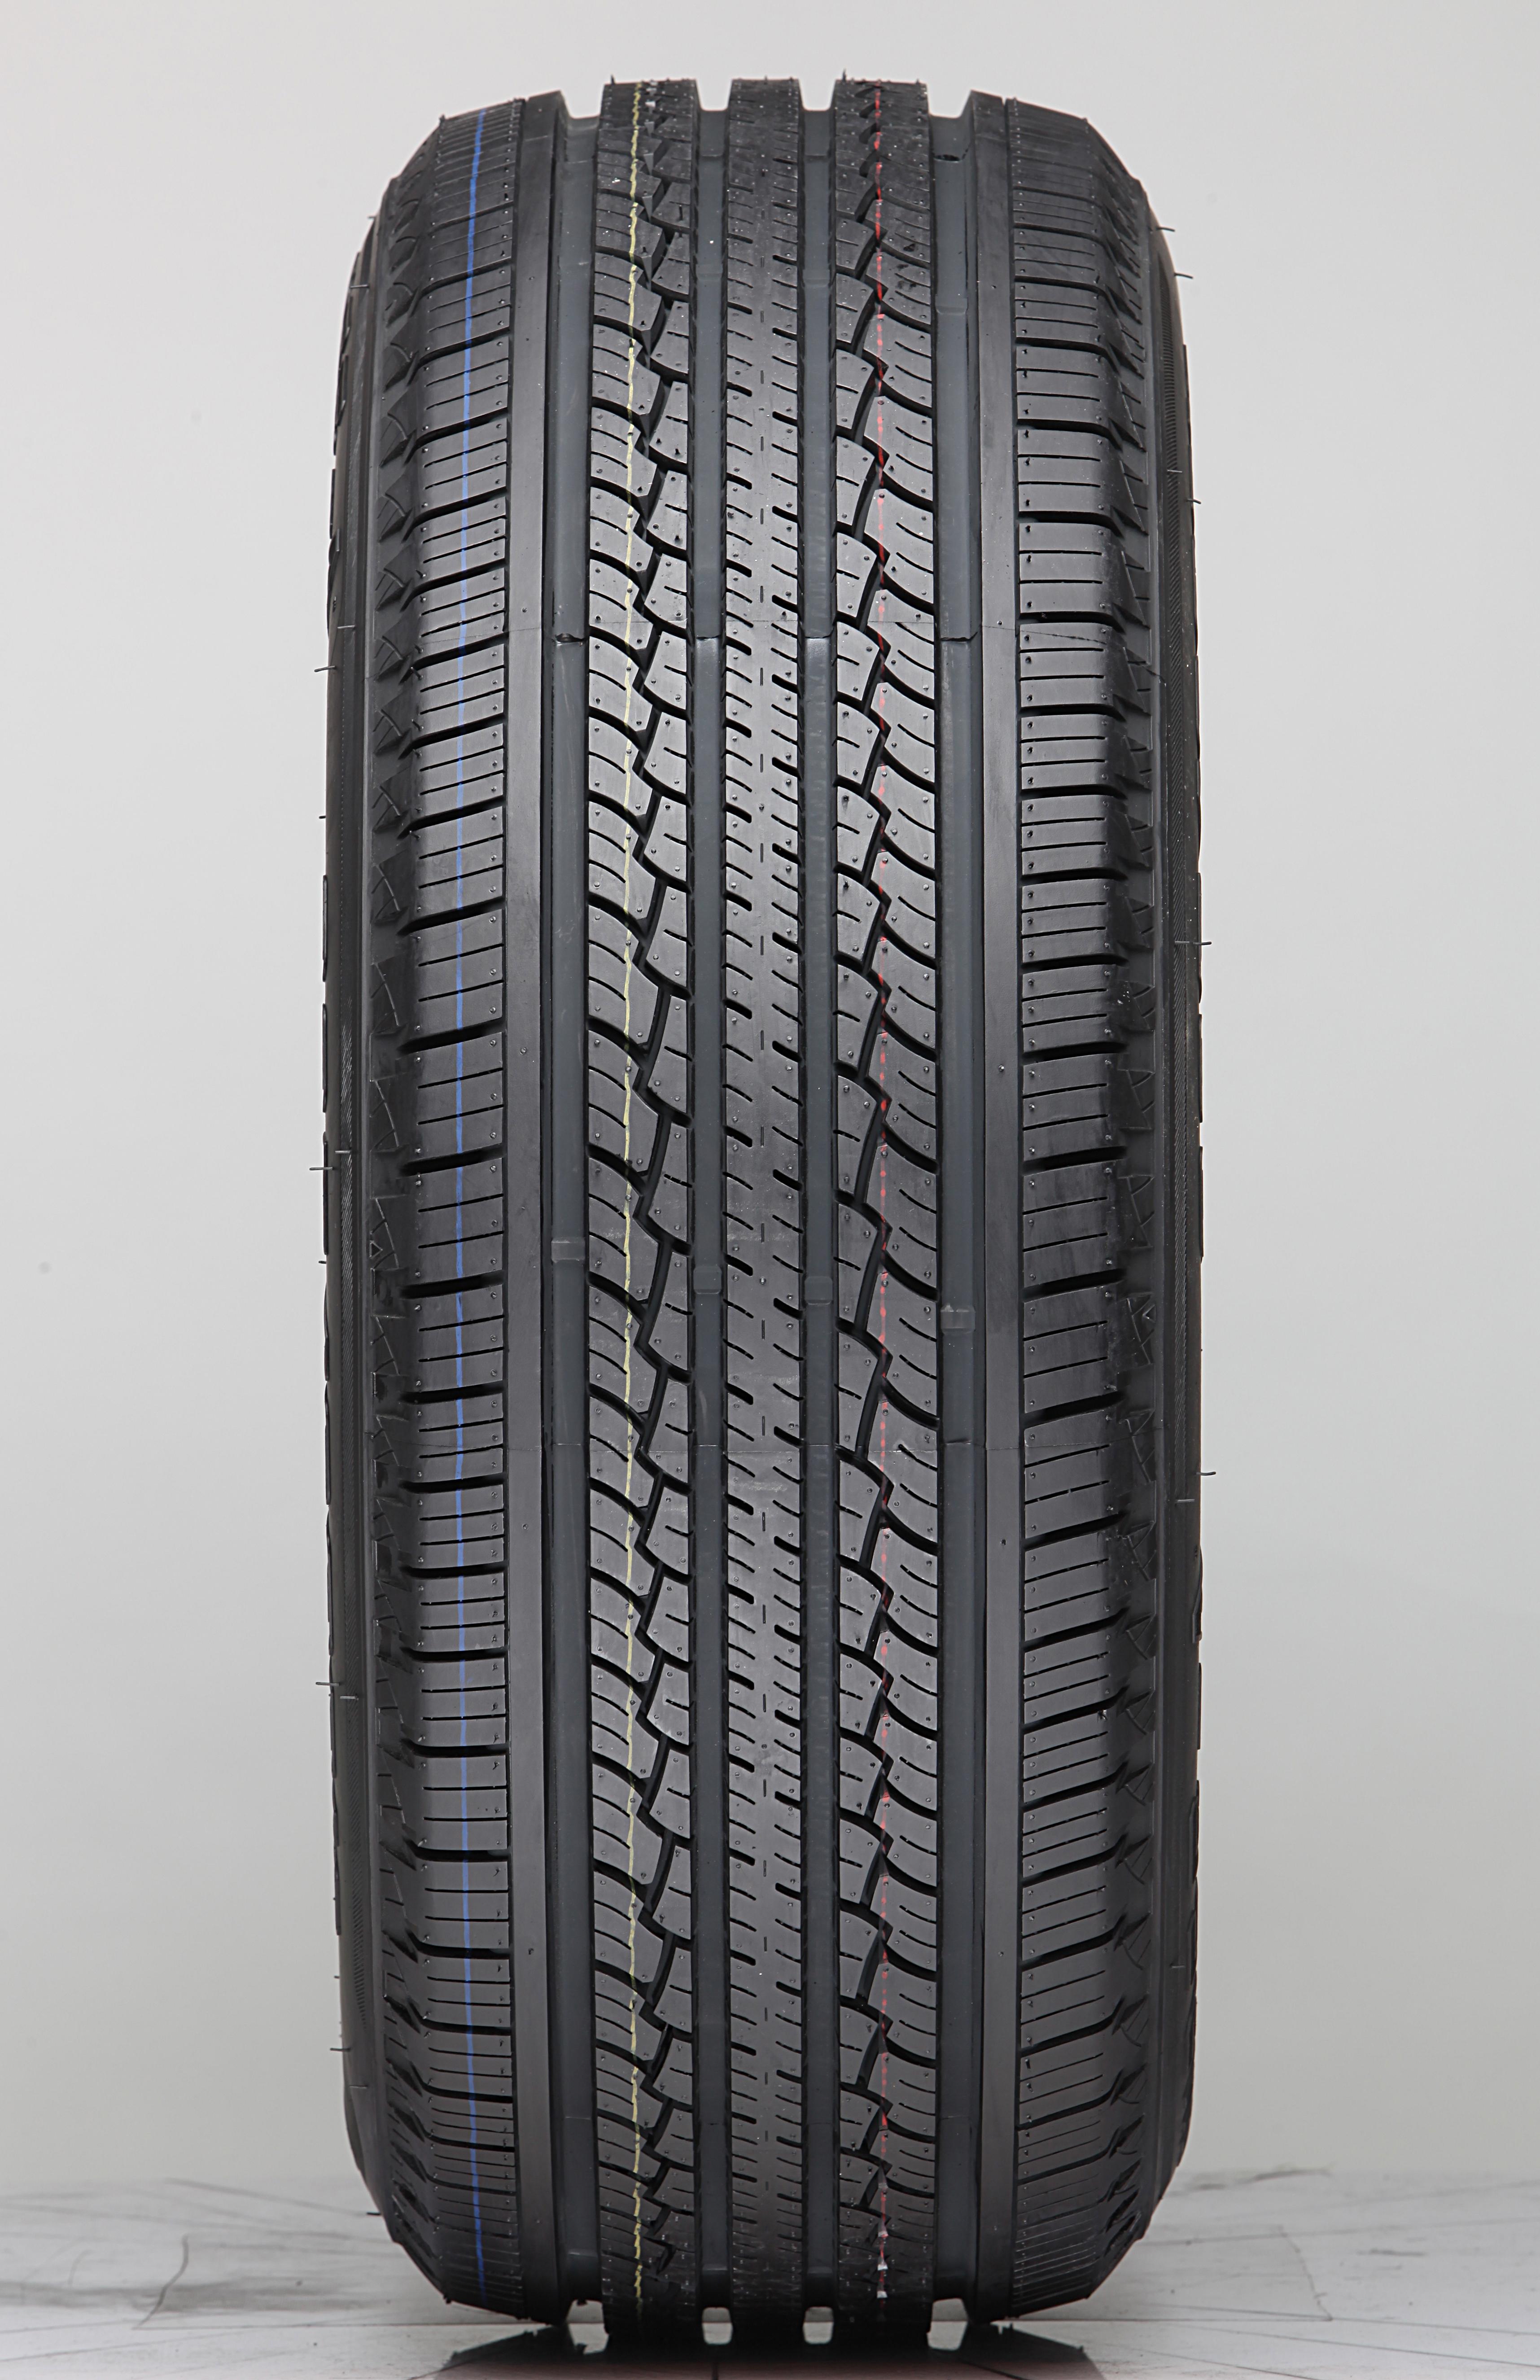 TOLEDO TL3000 Tyres